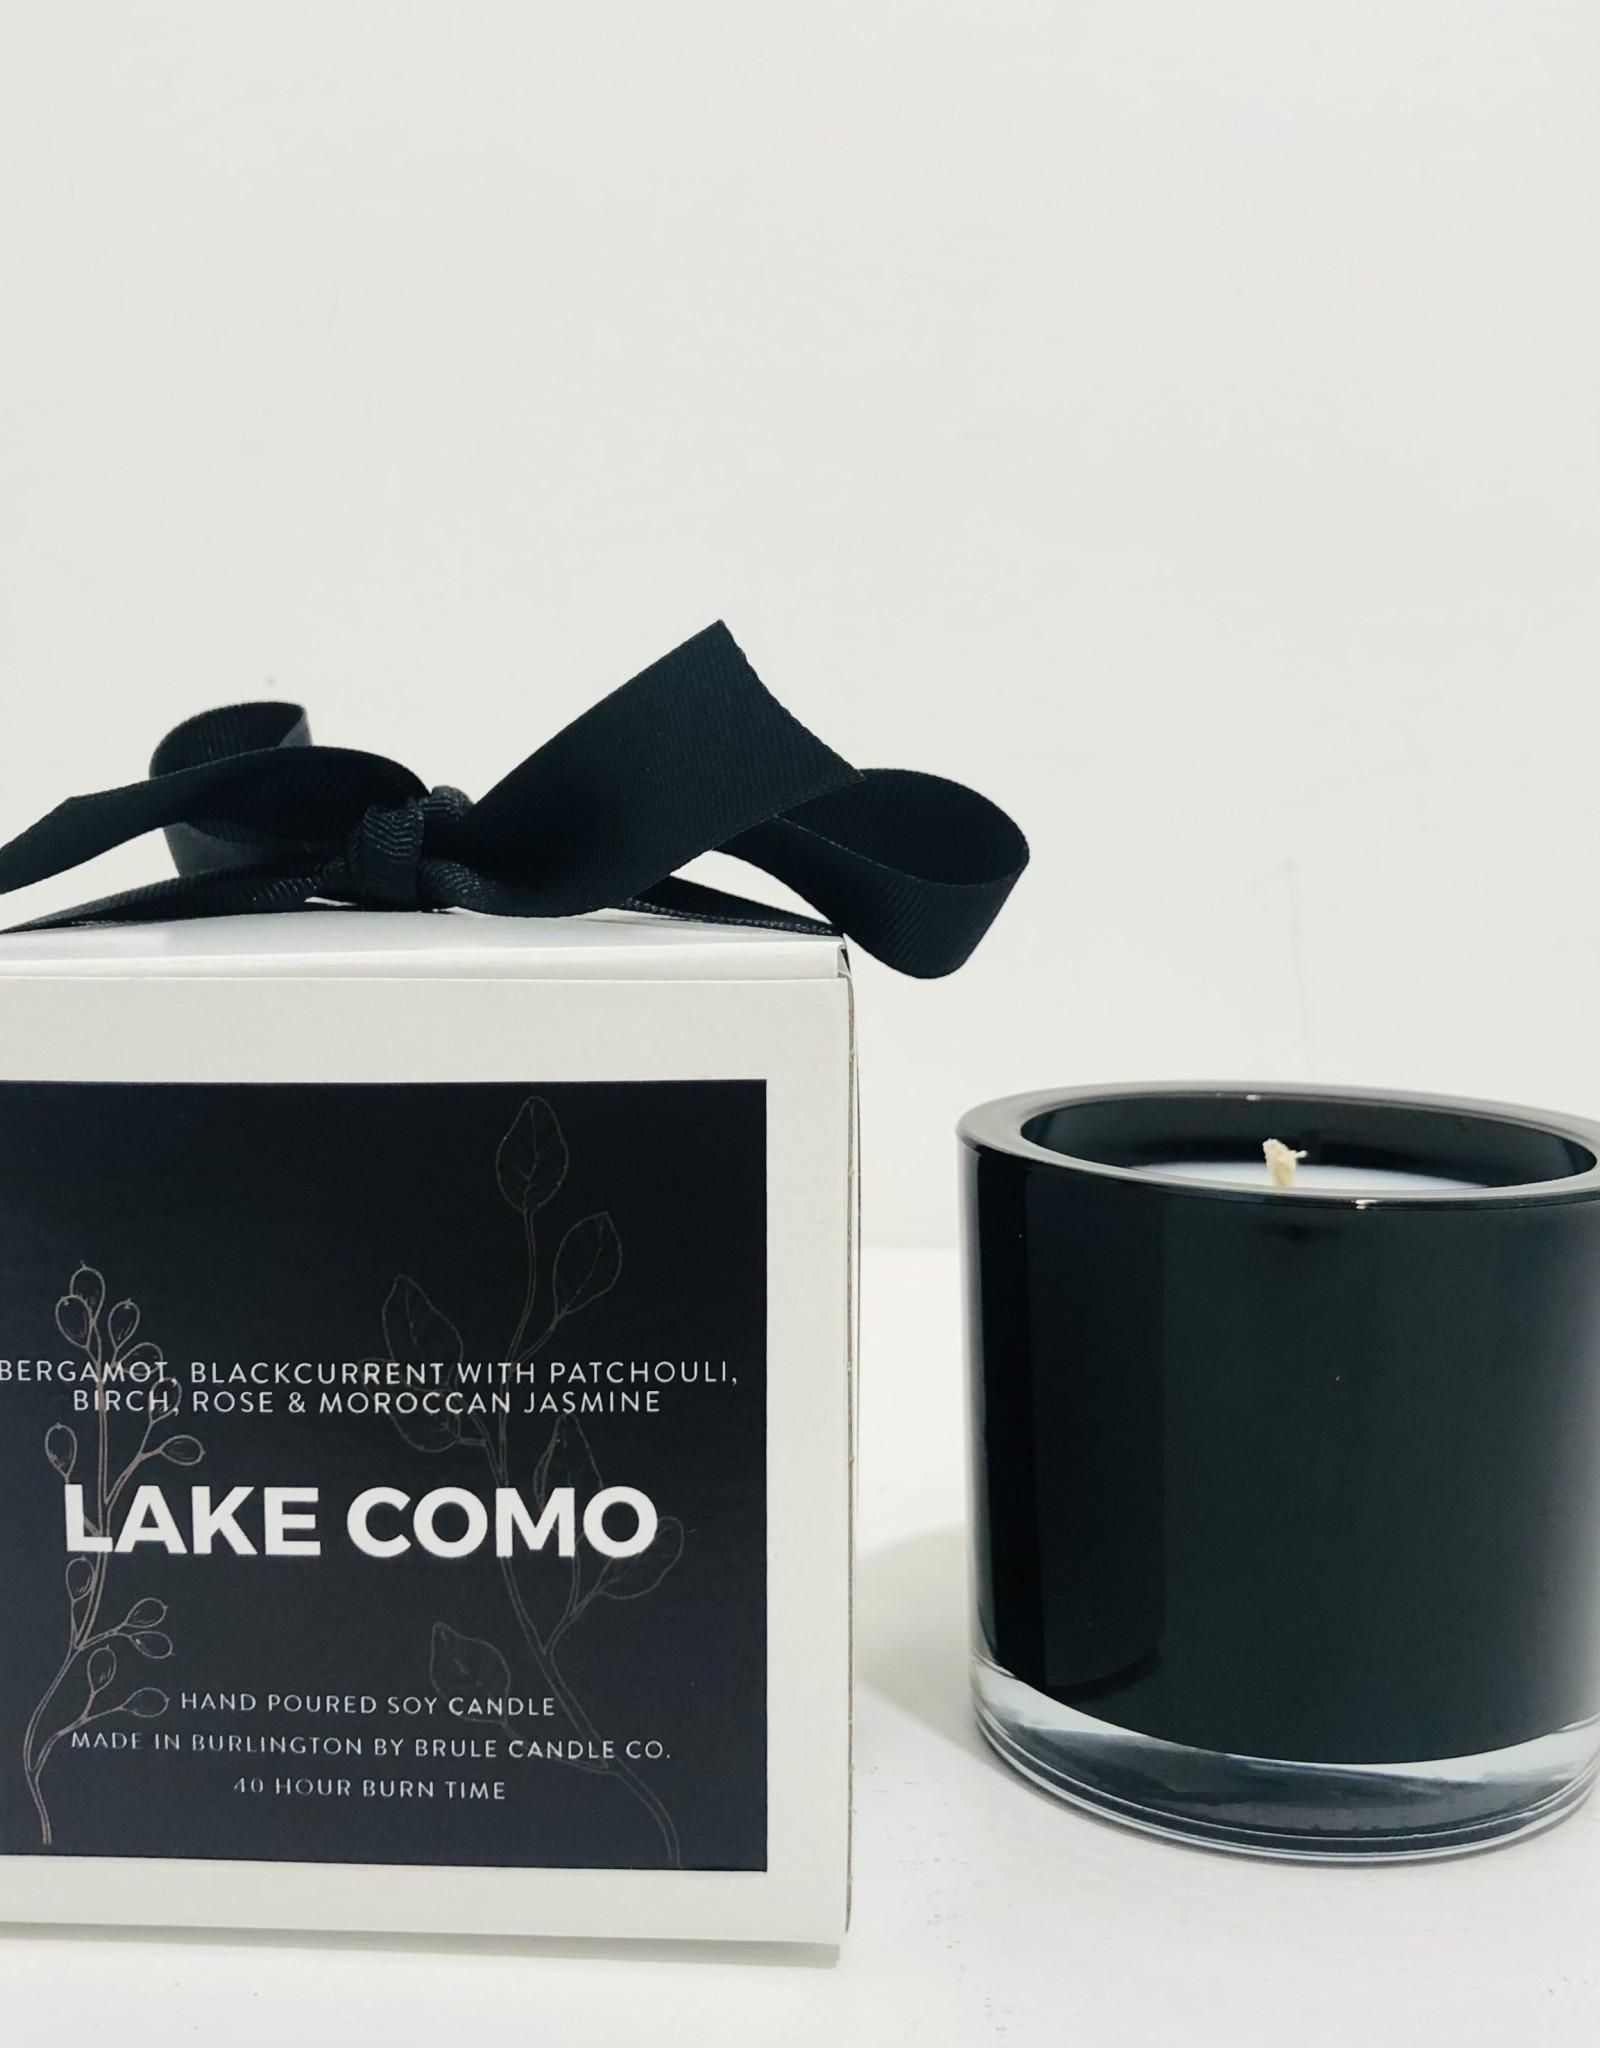 Brule Lake Como Candle